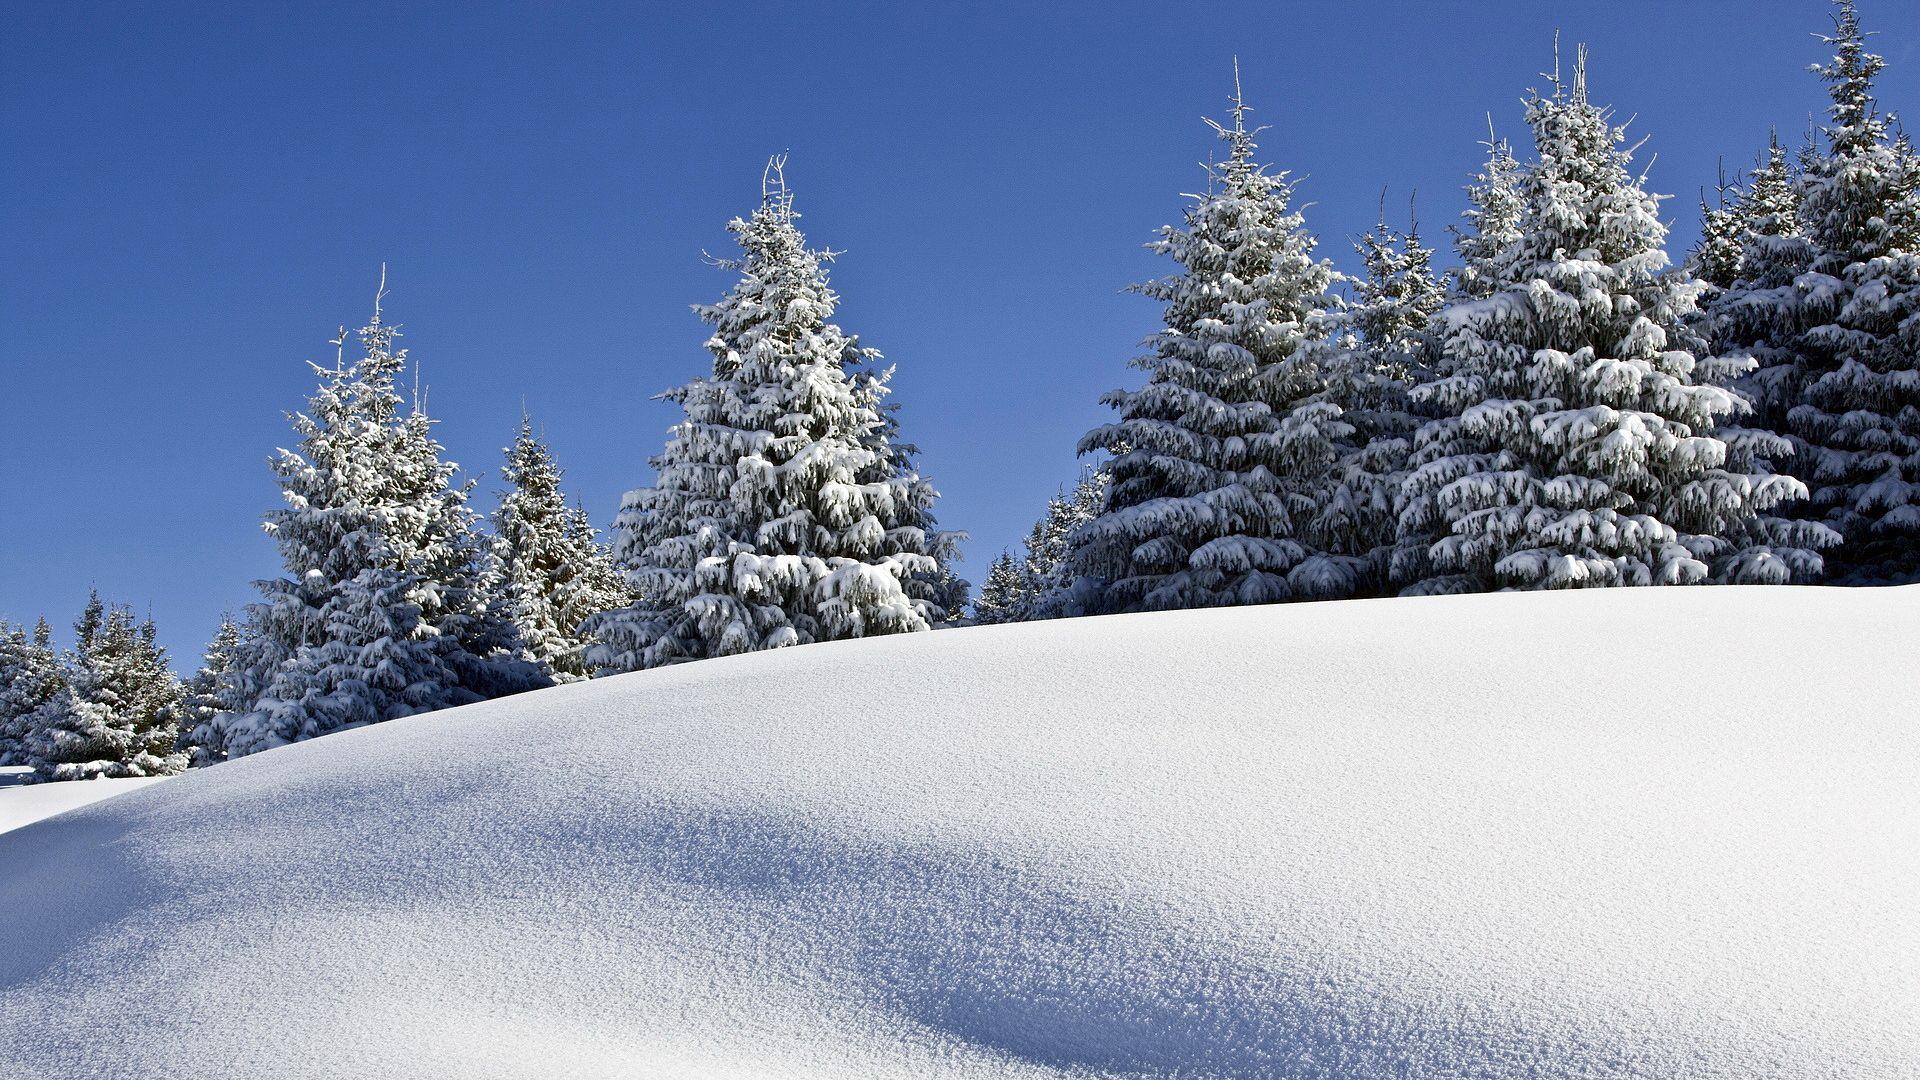 зимнее утро картинки красивые | Обои, Картинки, Природа